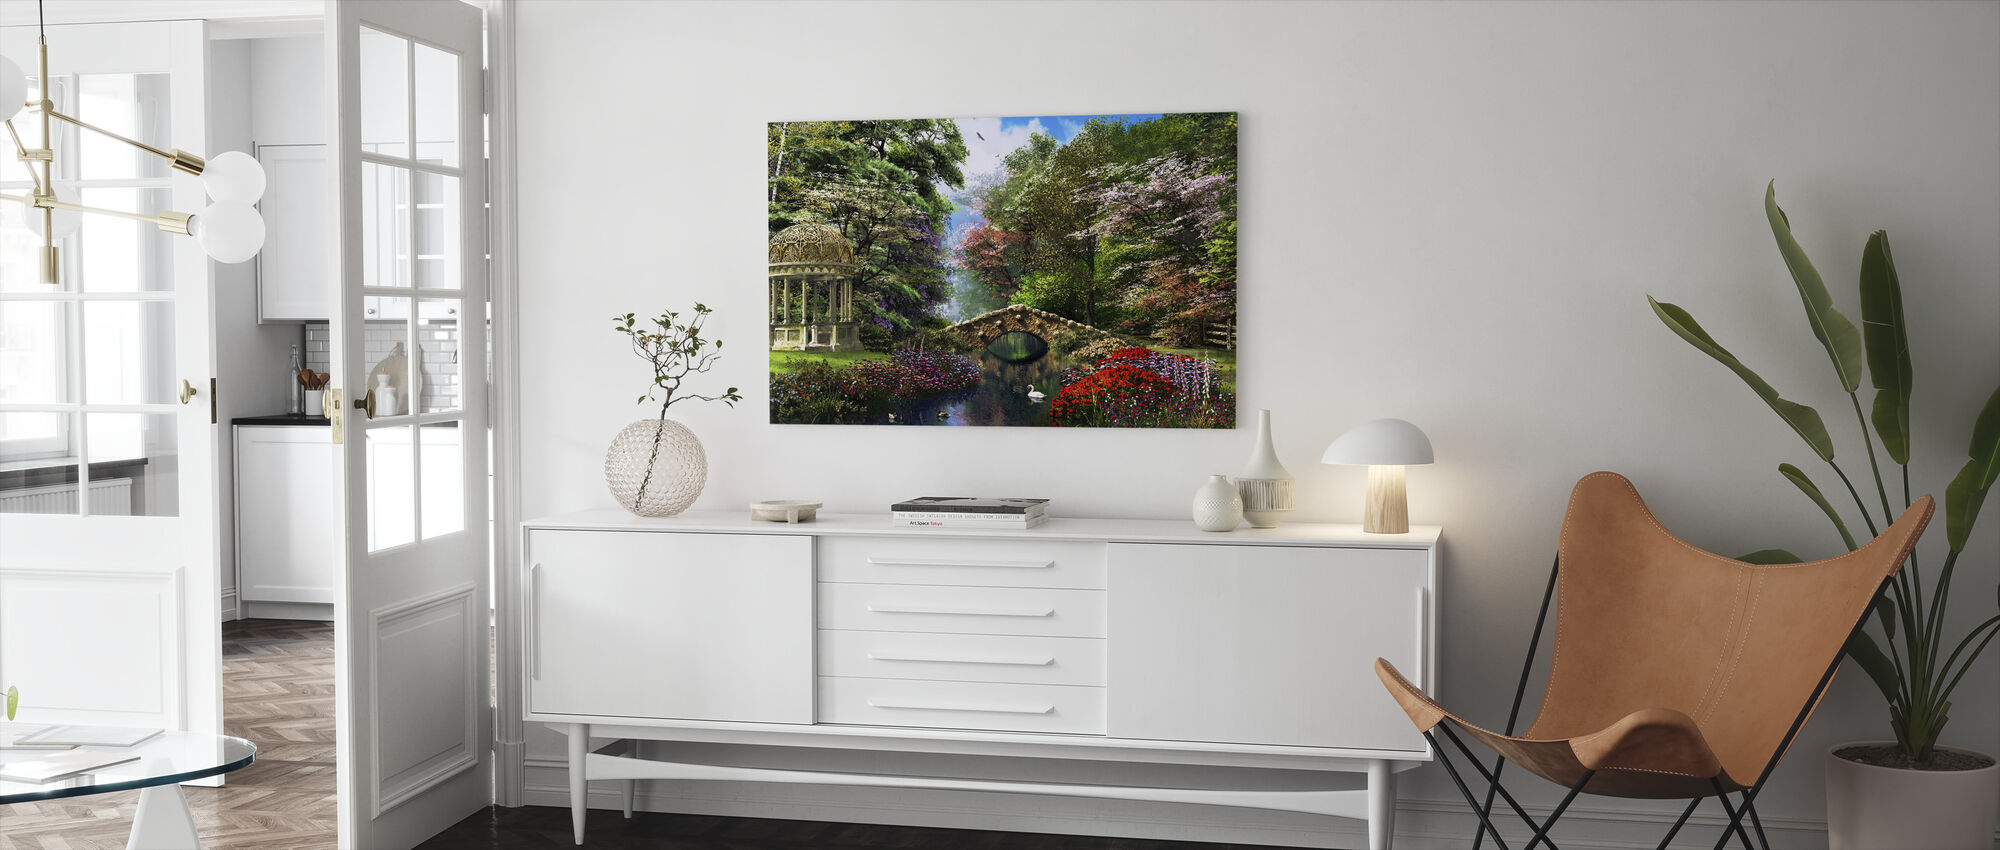 De Tuin van de Vrede - Canvas print - Woonkamer